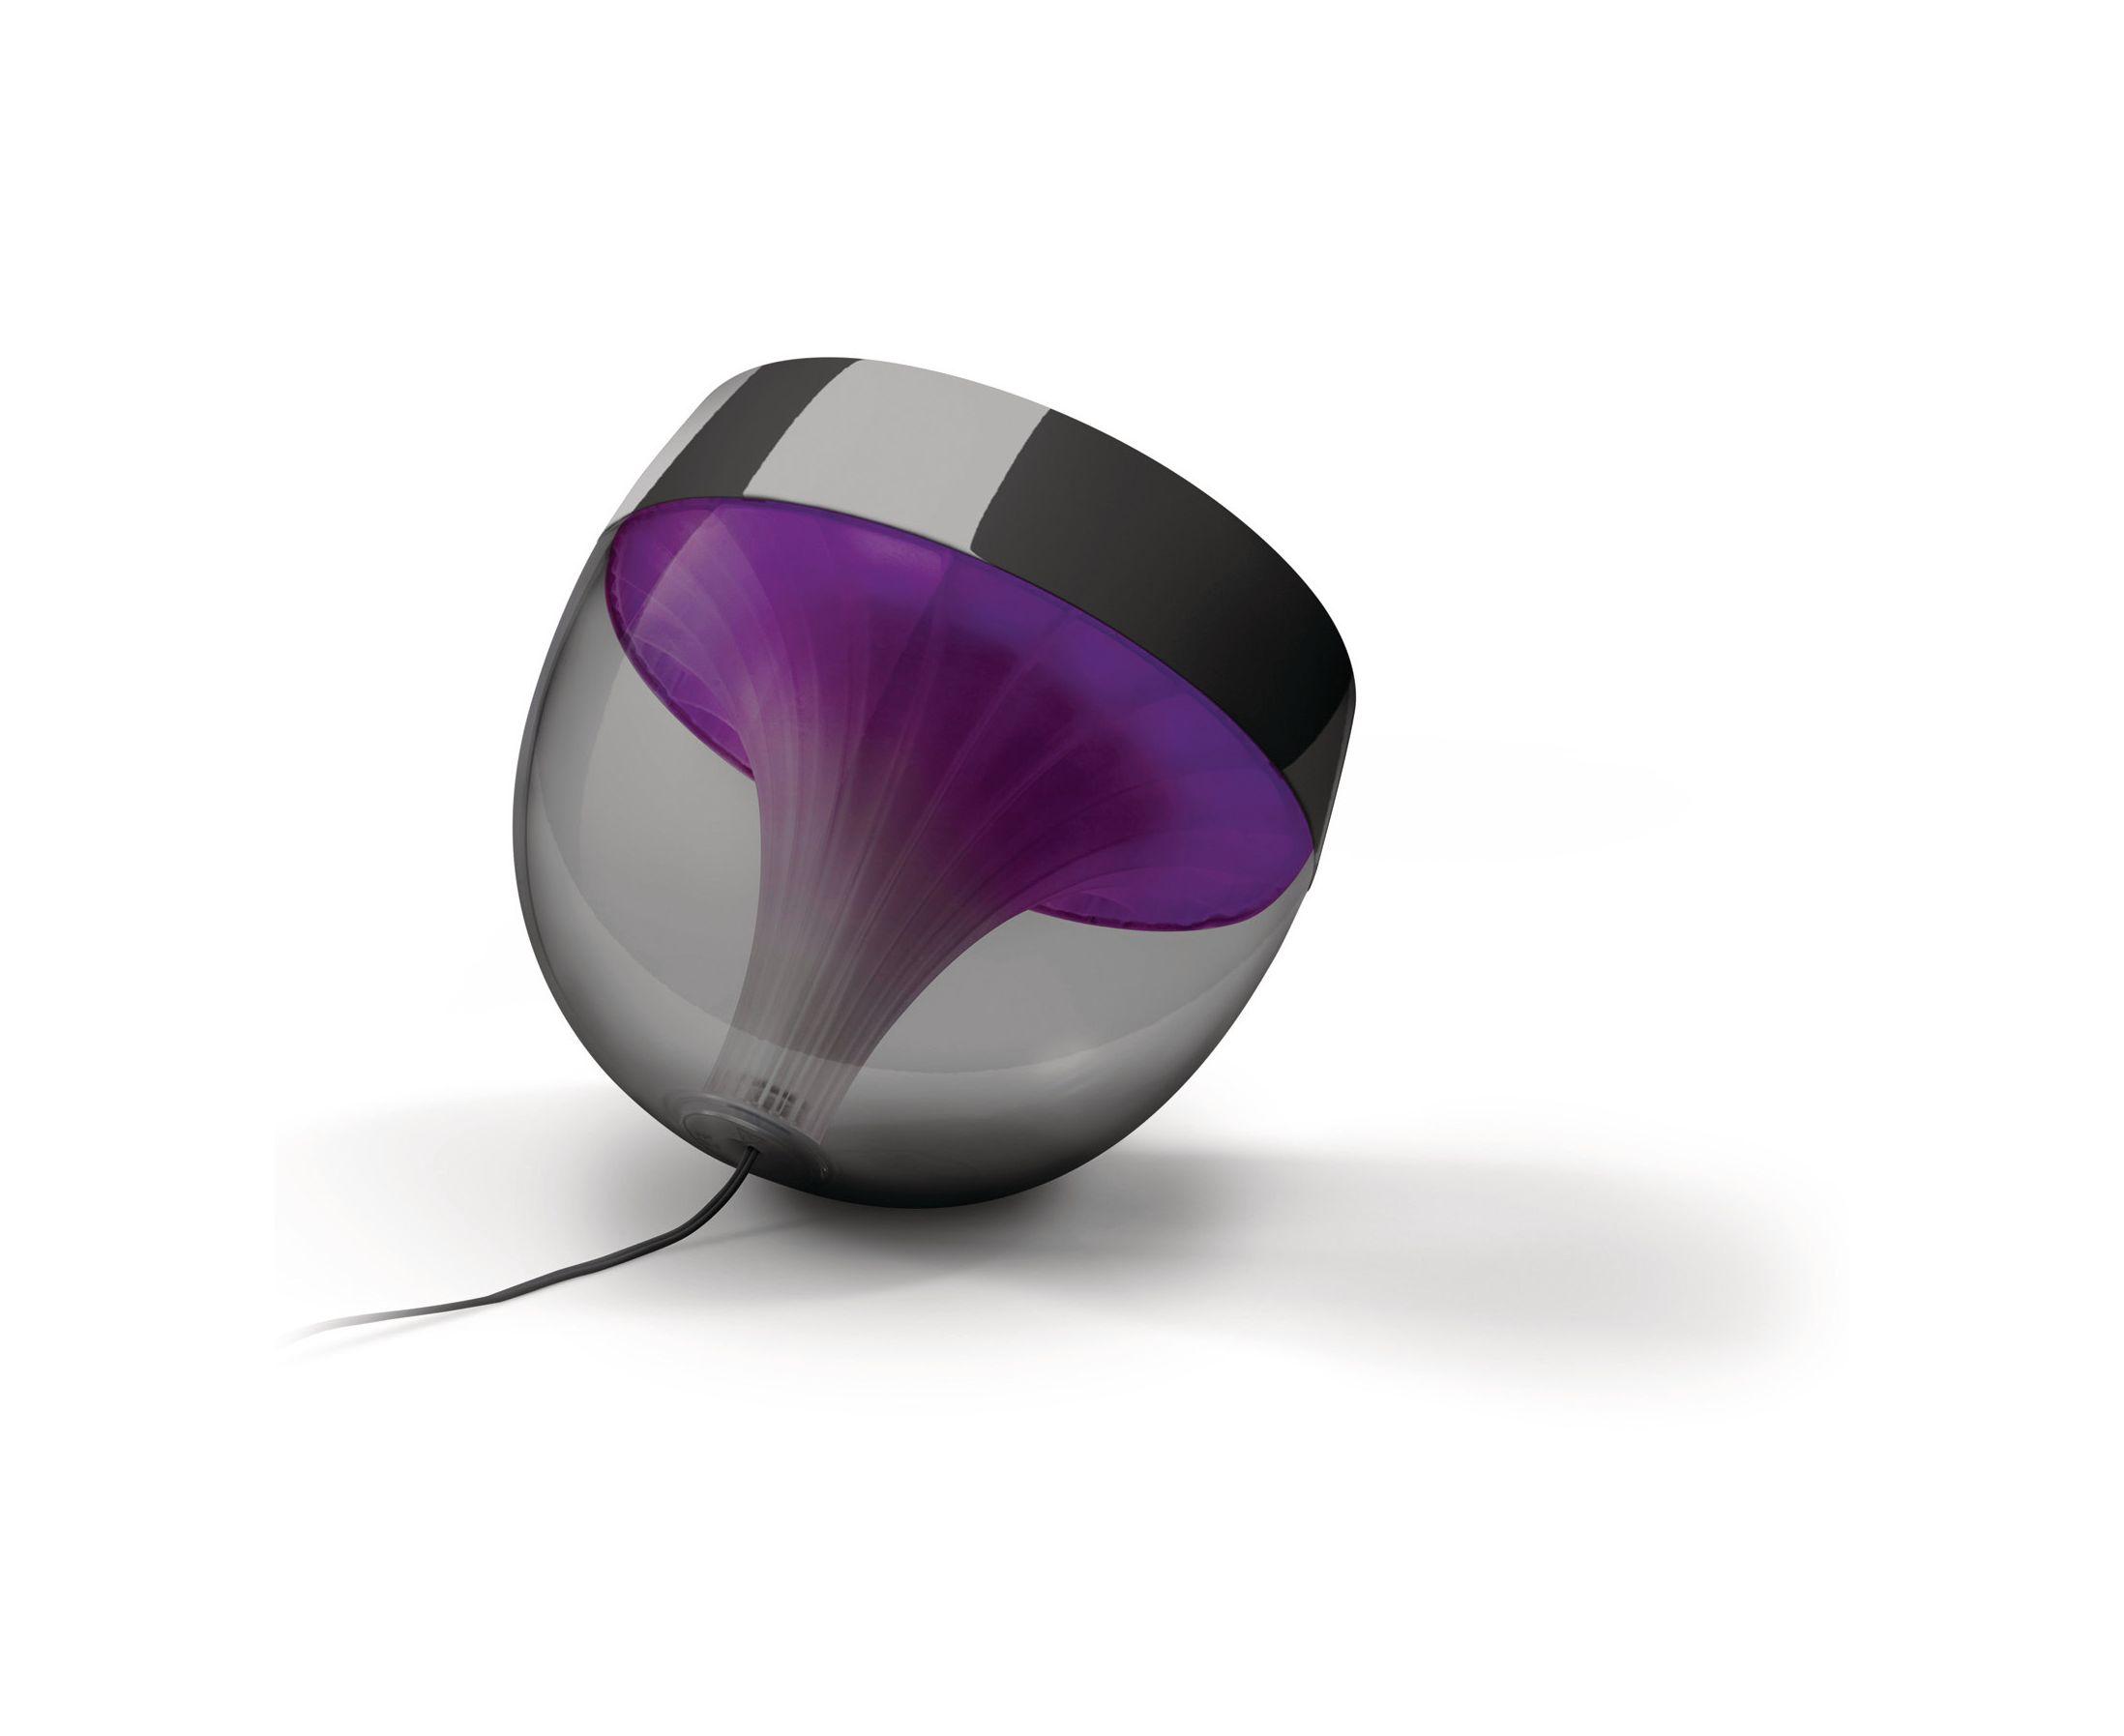 Philips LivingColors Iris LED Colour Changing Table Lamp Black Remote Control Liminaires